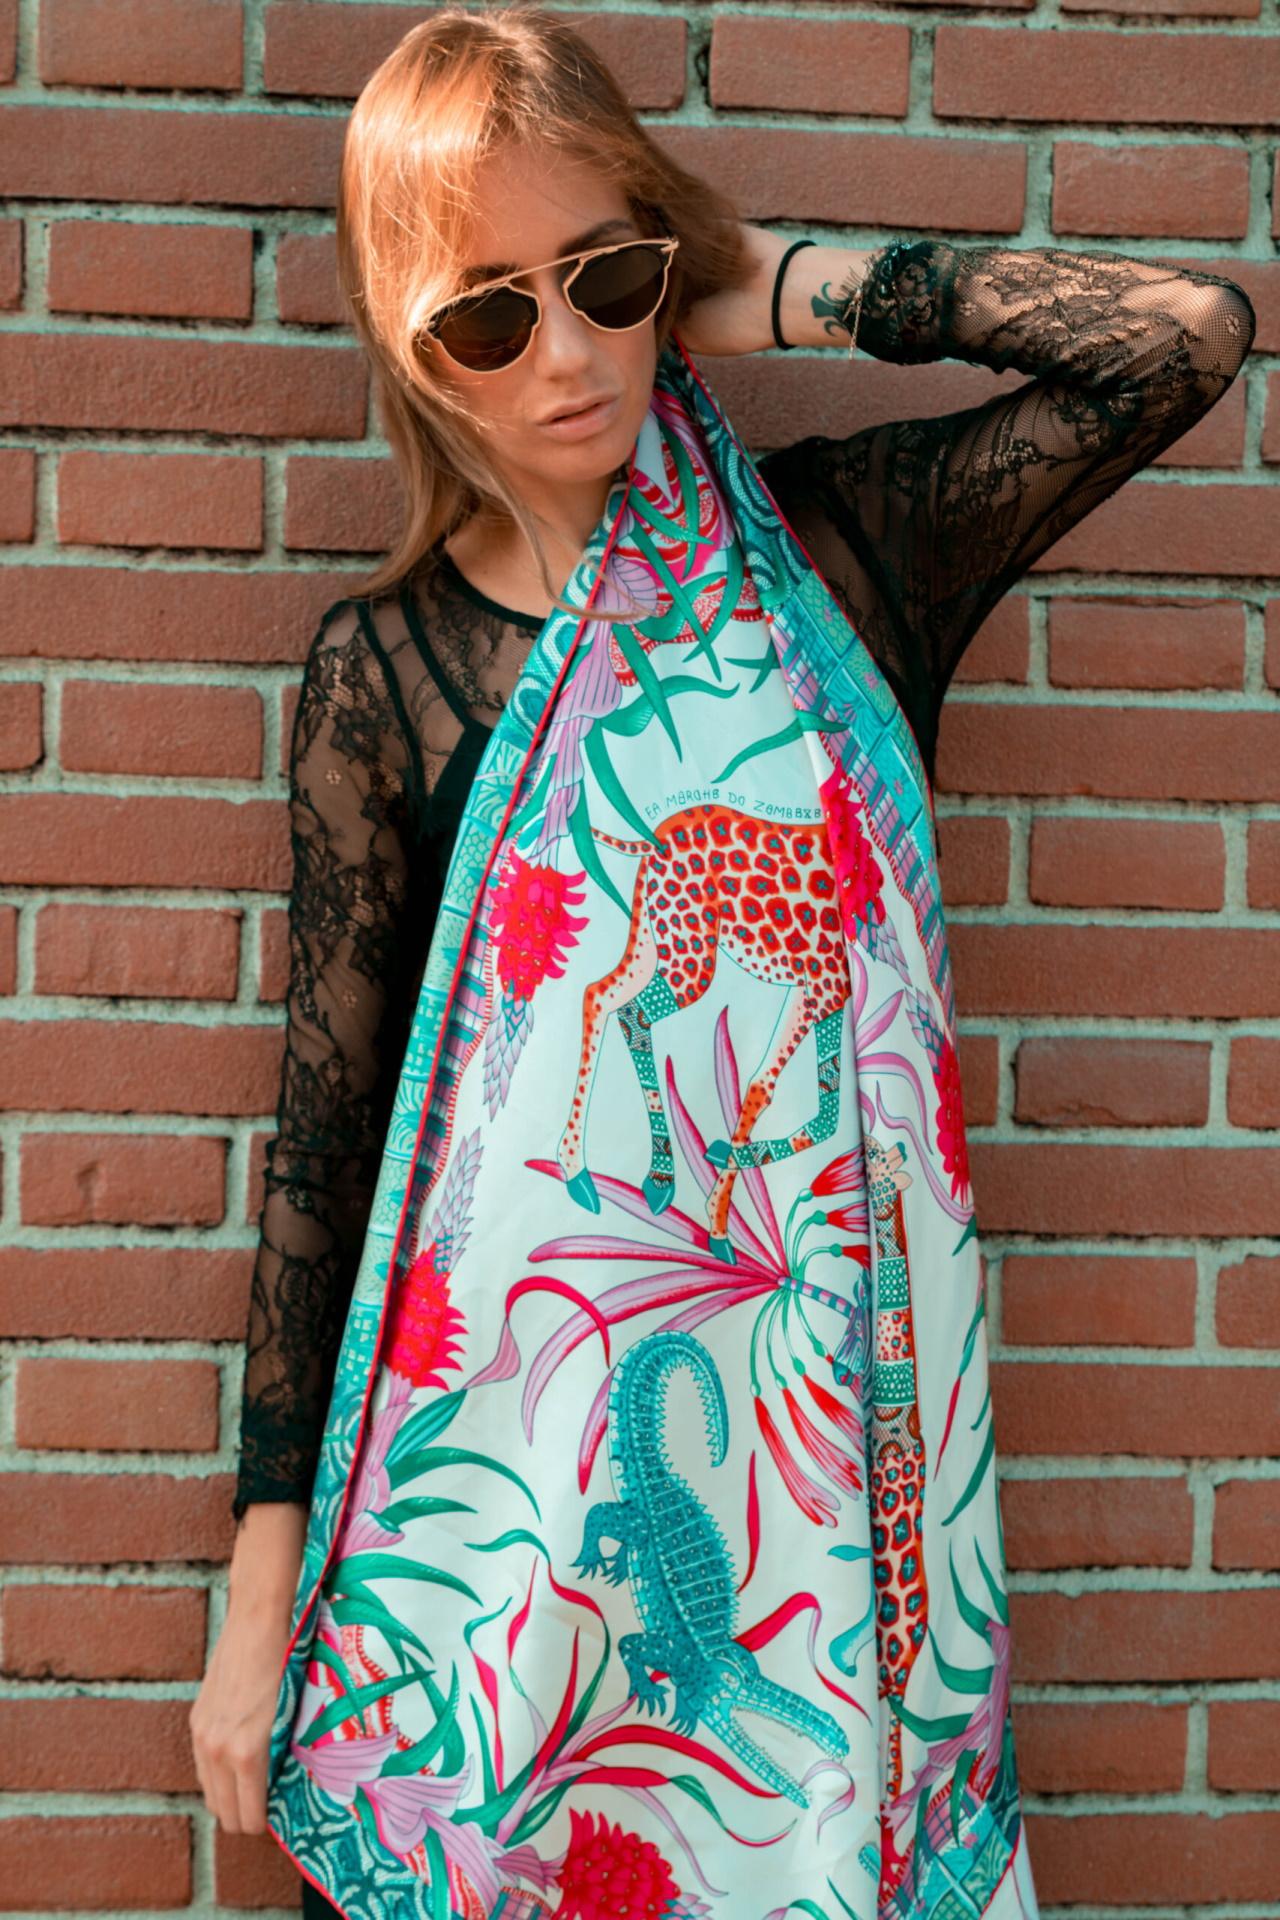 FOULARD H FOULARD SCIARPA DONNA 100 SETA 90CMX90CM 3 1stAmerican foulard/sciarpa 100% seta da donna 90cmx90cm